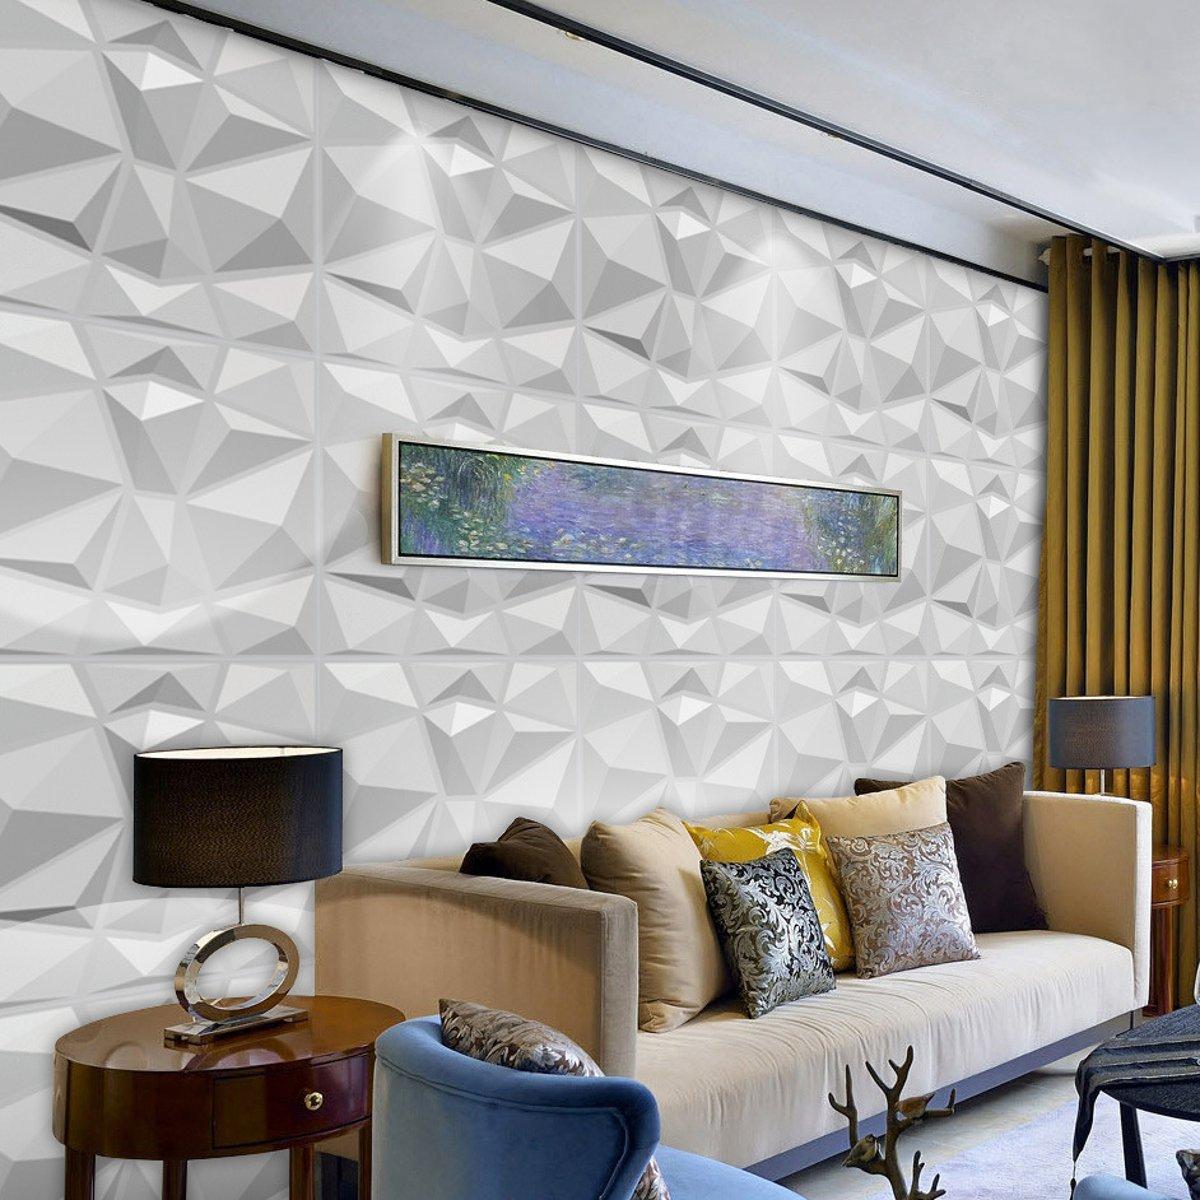 12 Pcs Decorative 3D Wall Panels in Diamond Design Matt White 30x30cm Wallpaper Mural Tile-Panel-Mold